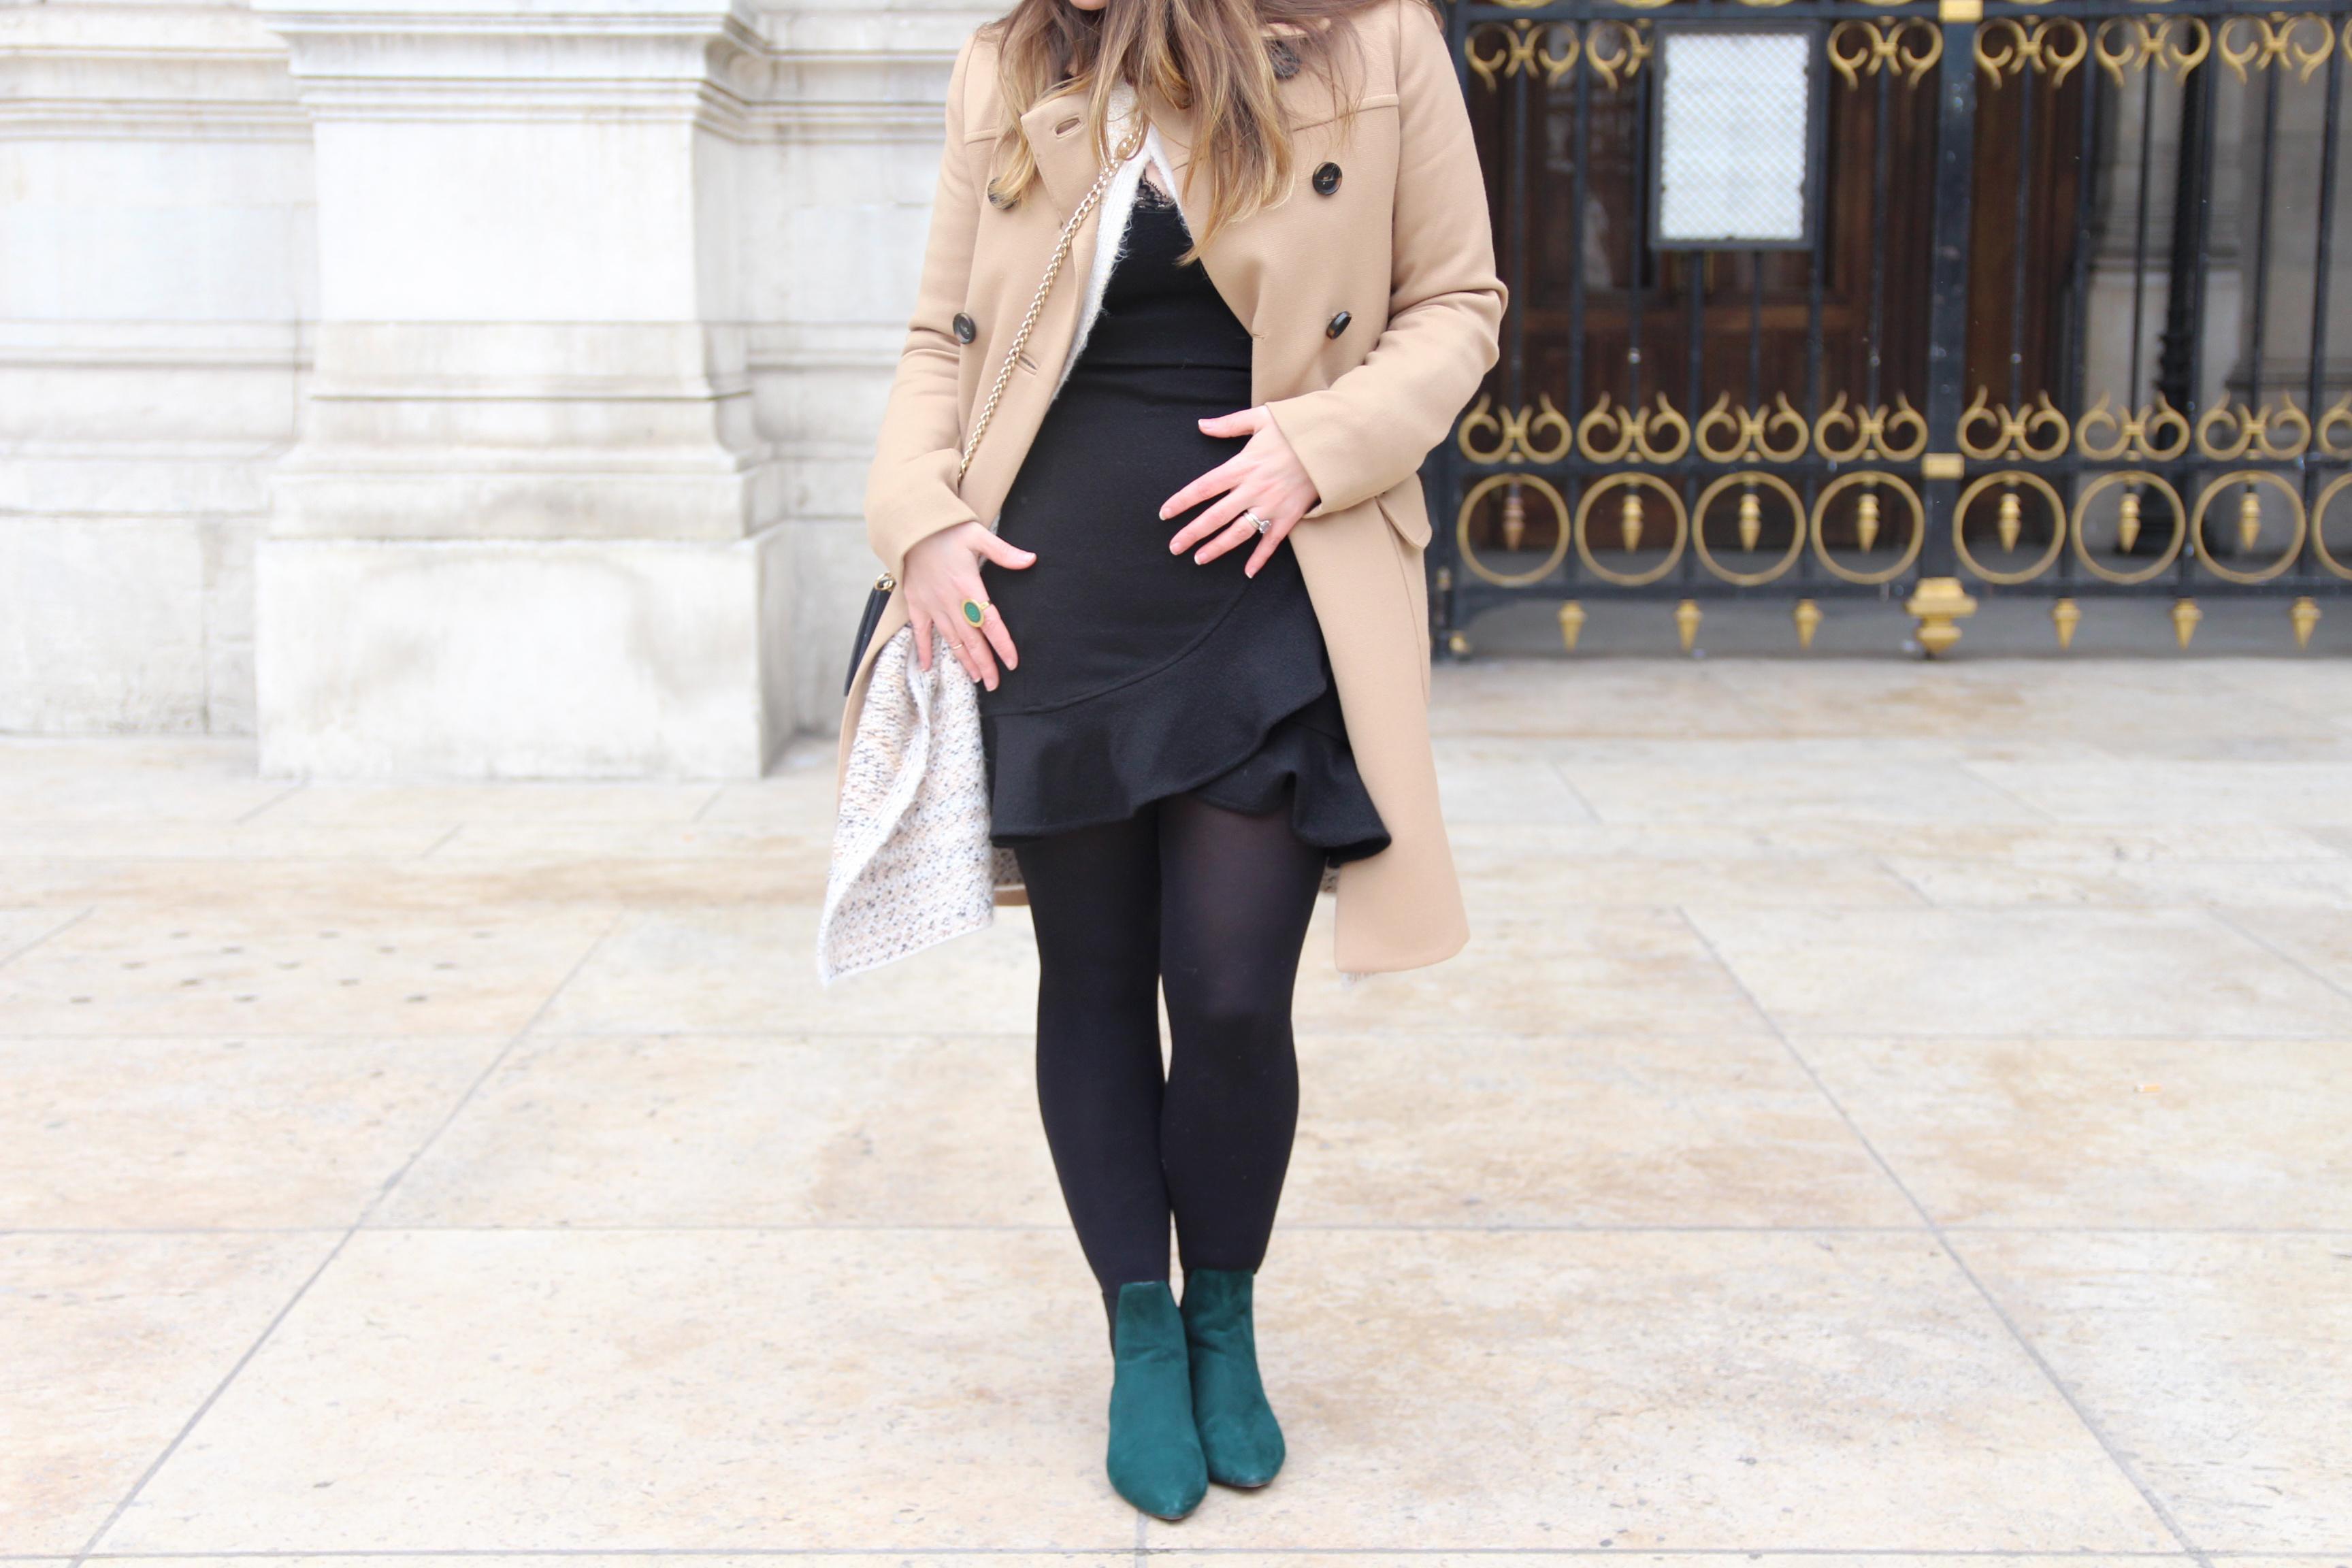 paris-opera-garnier-winter-day-influencer-style-personalstylist-imageconsultant-seralynepointcom-img_6674